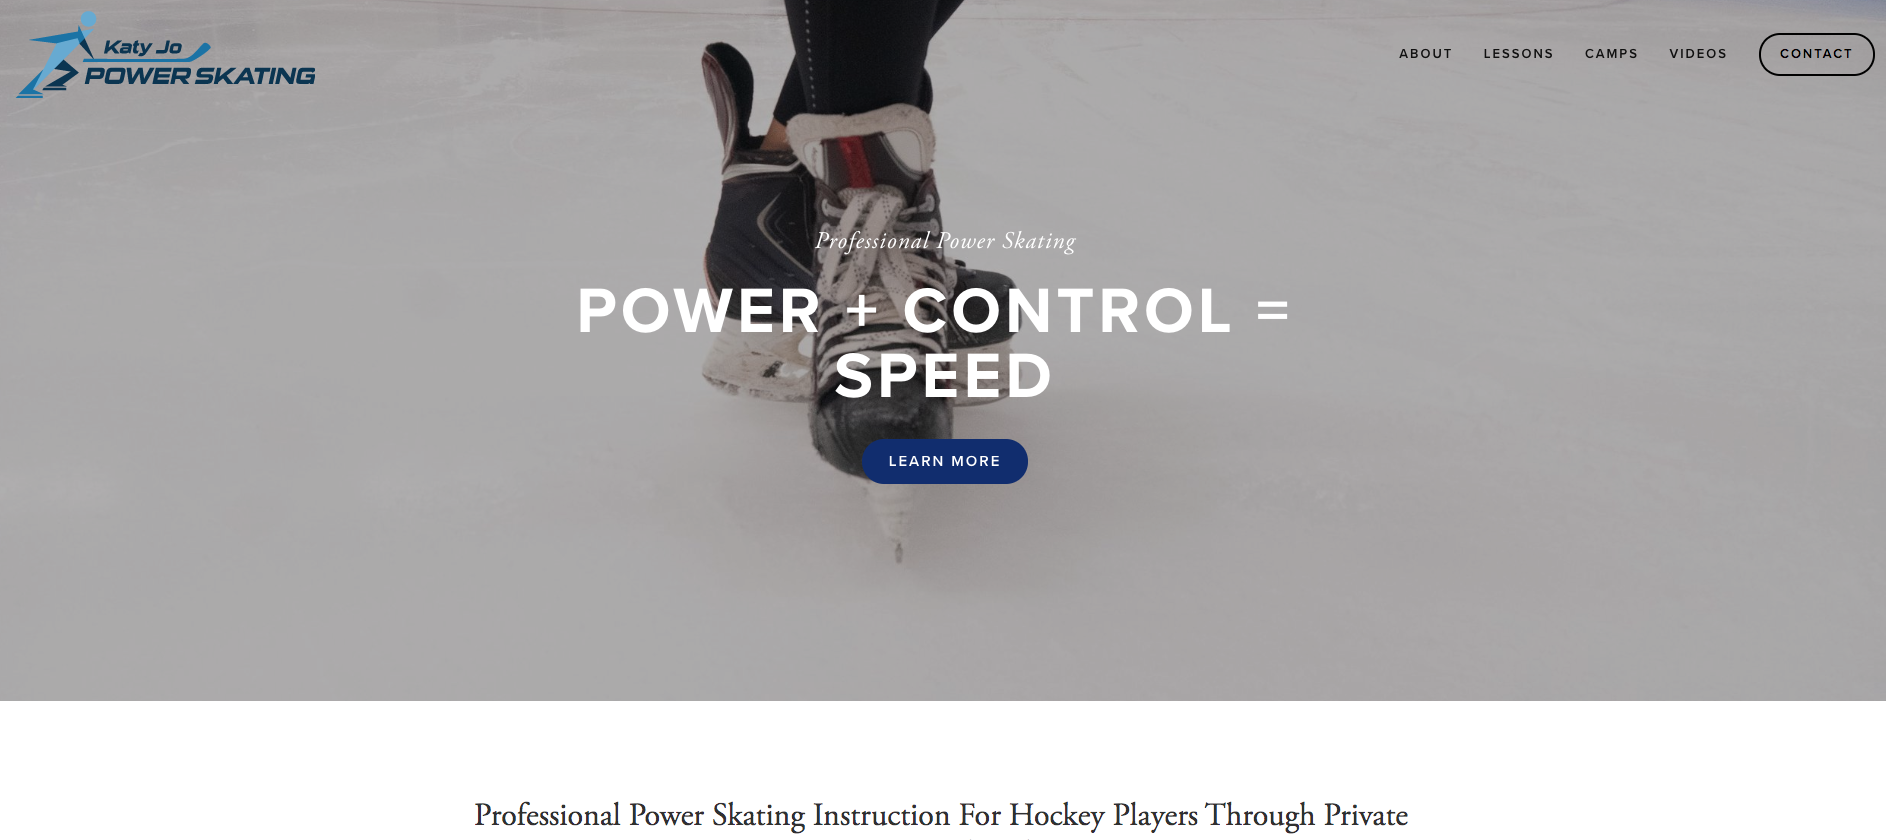 Katy Jo Power Skating website design using Squarespace.